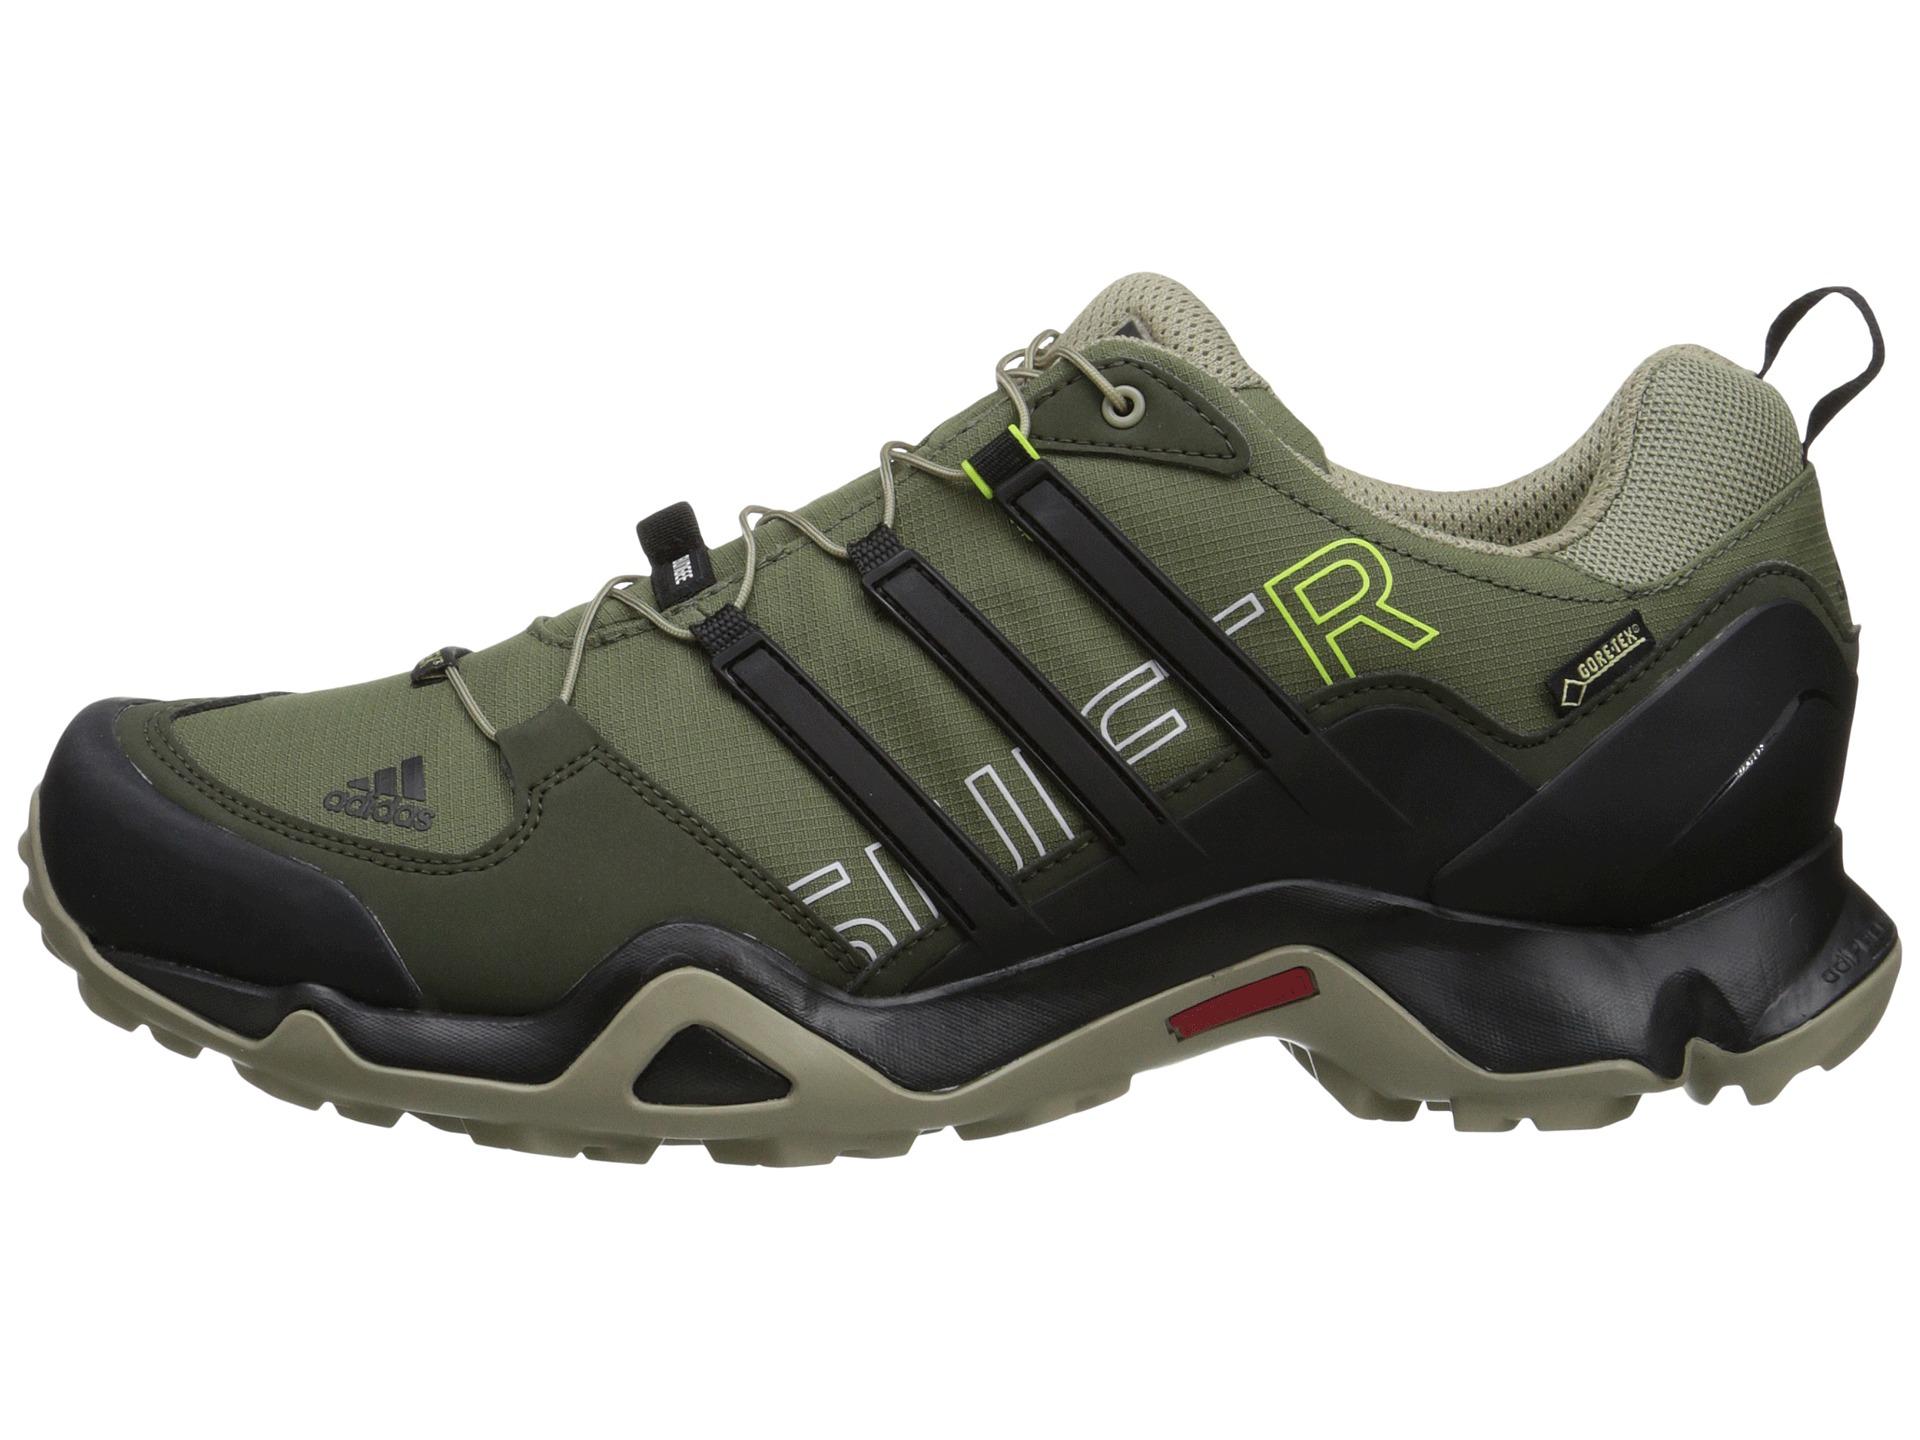 Adidas Men S Fashion Sneakers Terrex Swift R Gtx Shoes